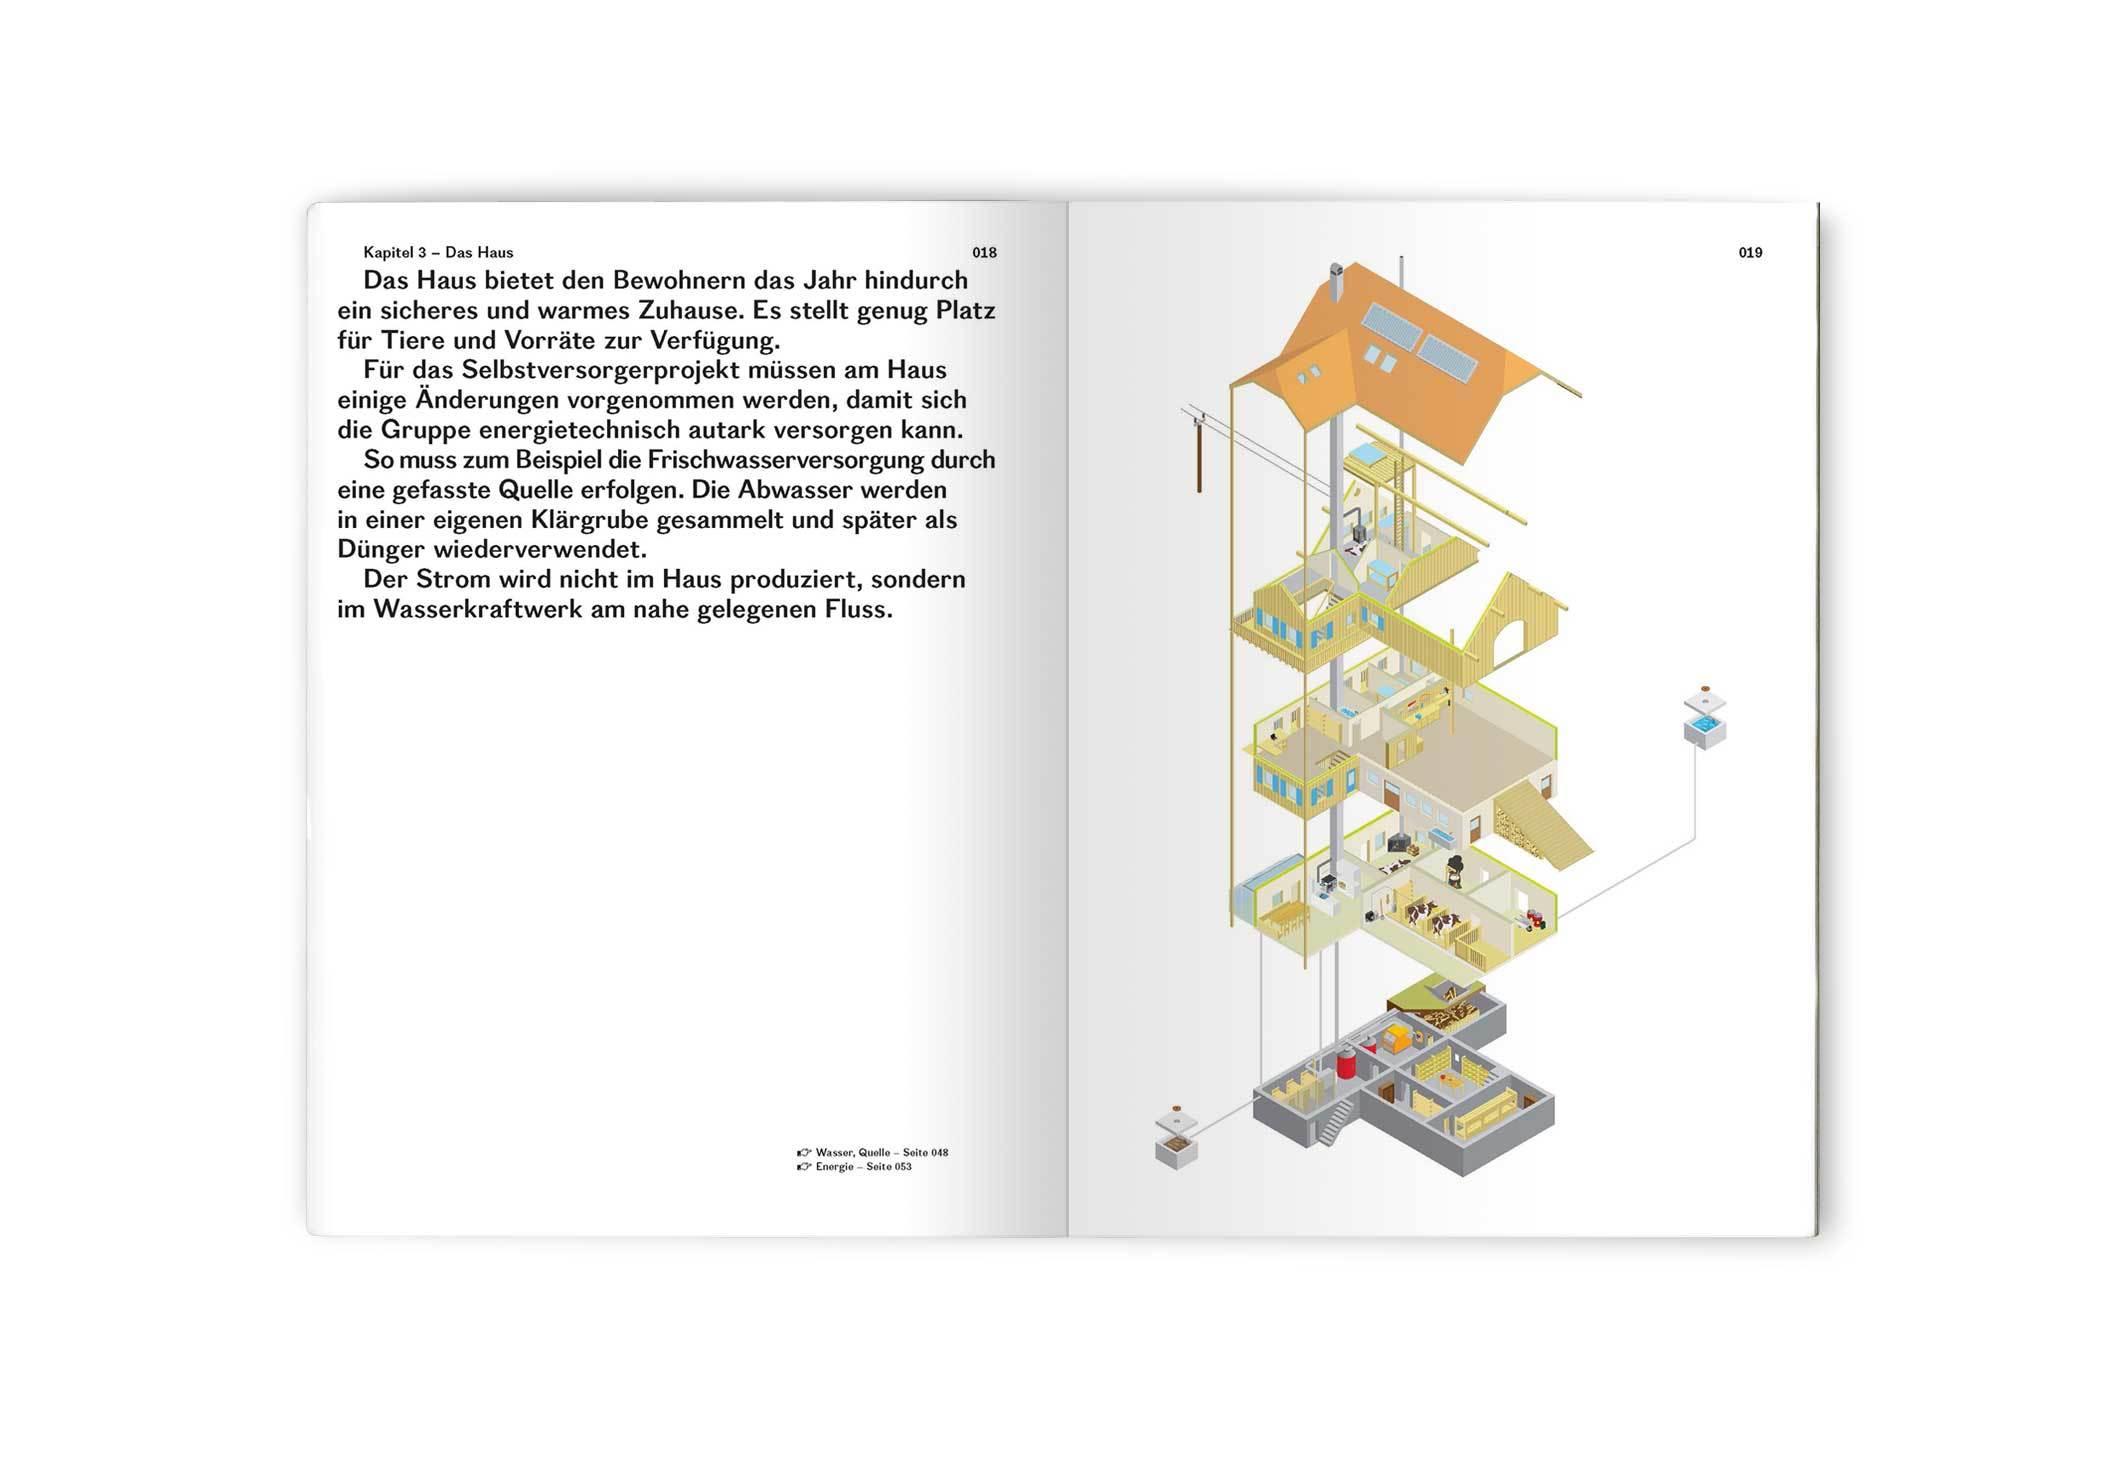 autark top siemens autarkes kochfeld cm autark test. Black Bedroom Furniture Sets. Home Design Ideas